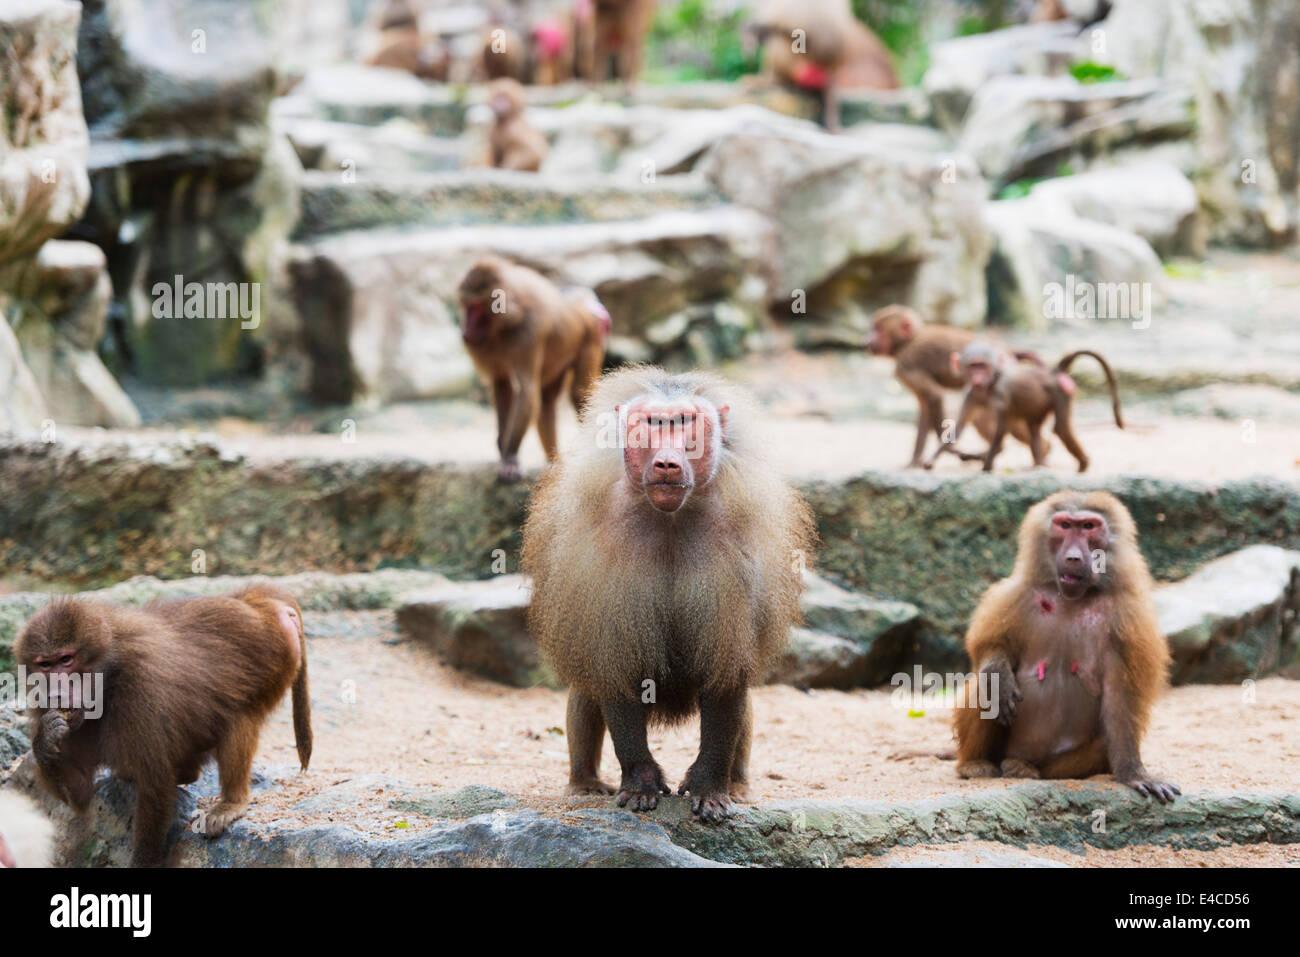 South East Asia, Singapore, Singapore zoo, Ethiopian baboon, Gelada (Theropithecus gelada) - Stock Image